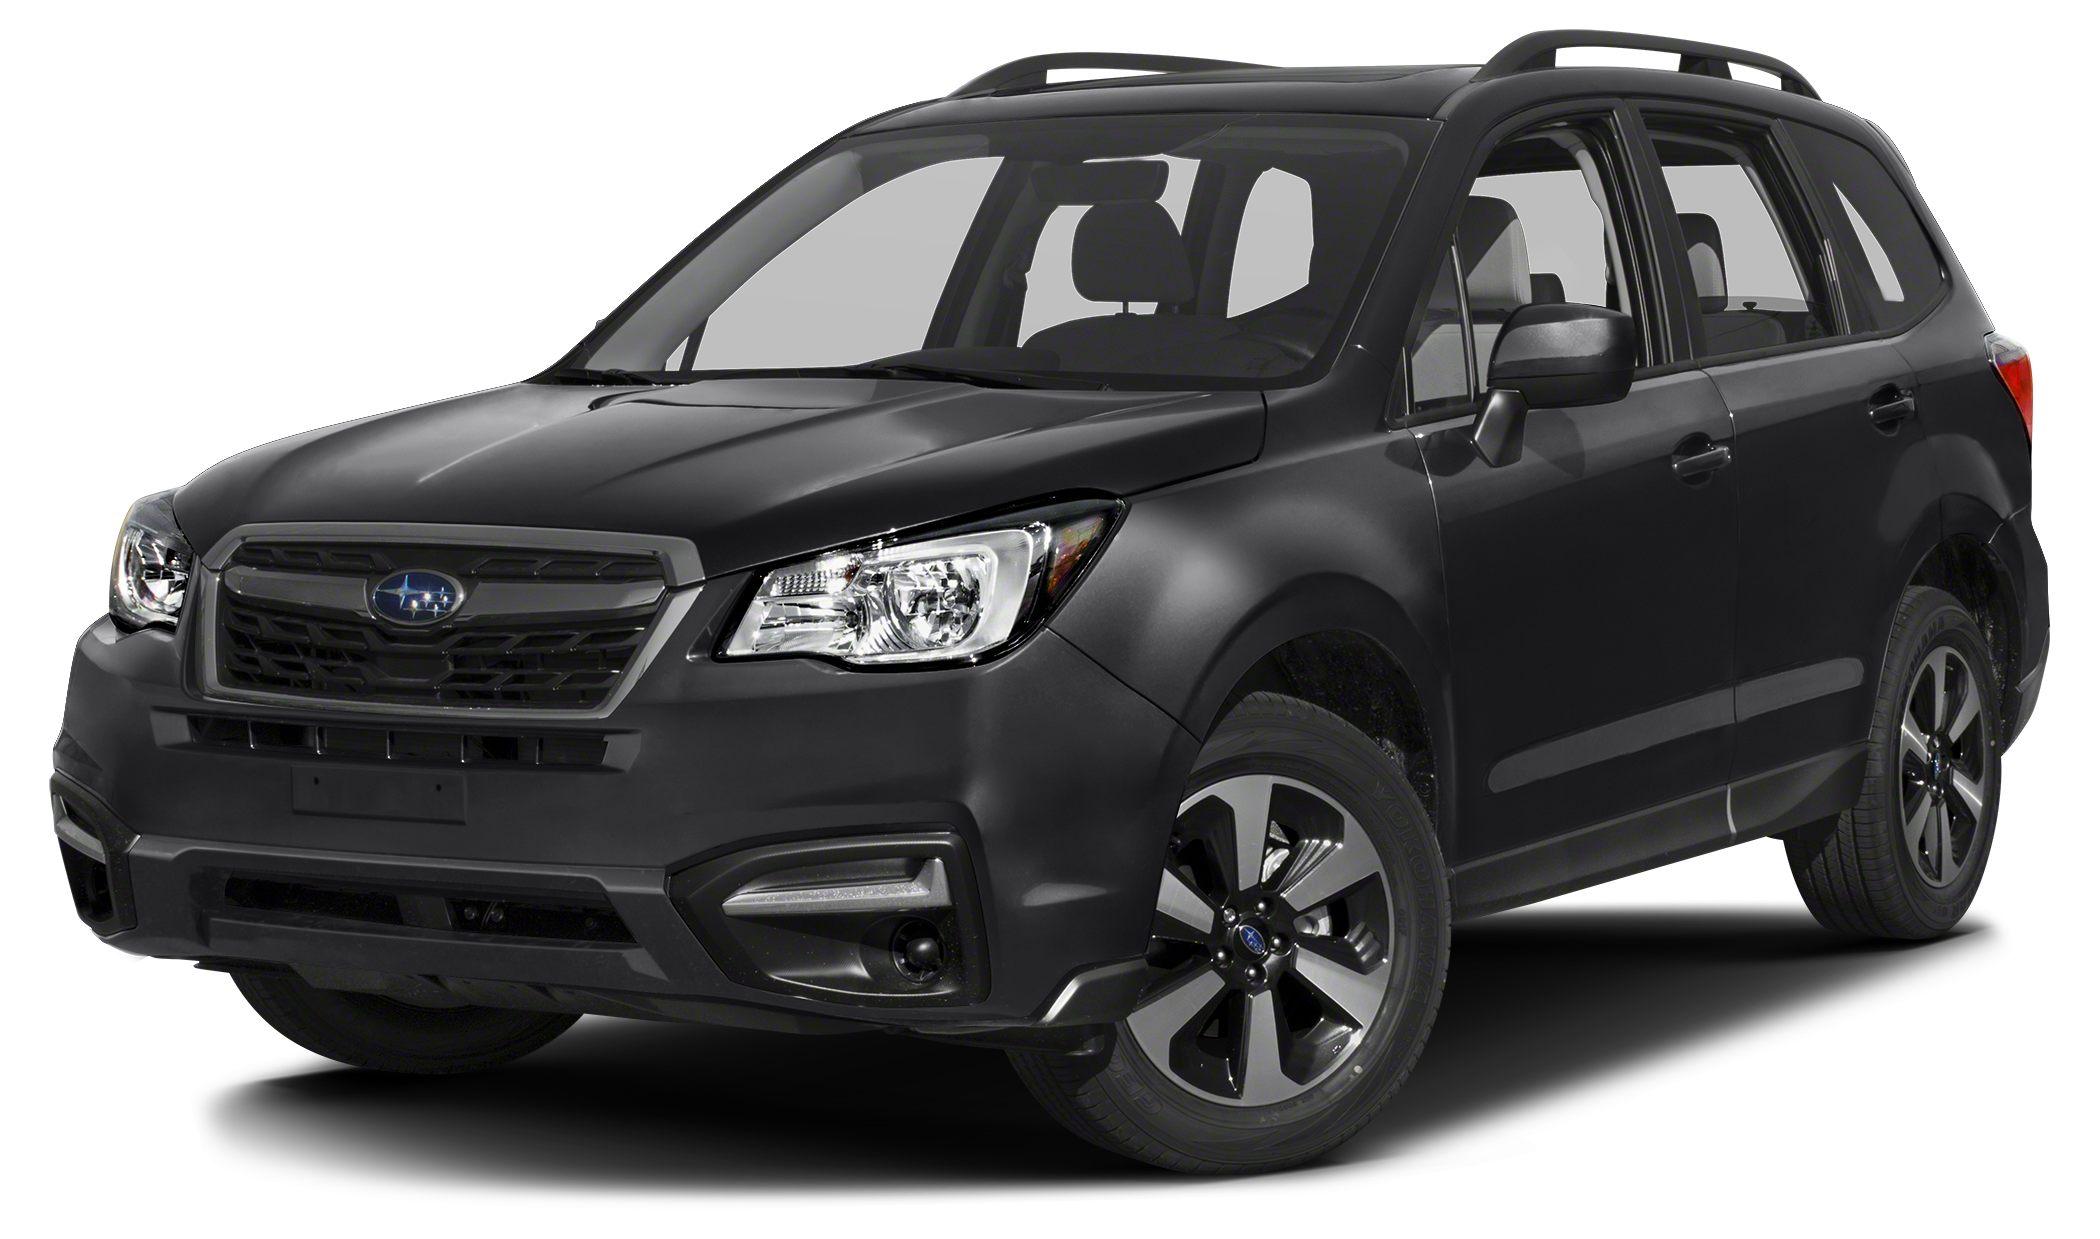 2017 Subaru Forester 25i Premium Miles 5Color Crystal Black Silica Stock SH554255 VIN JF2SJ